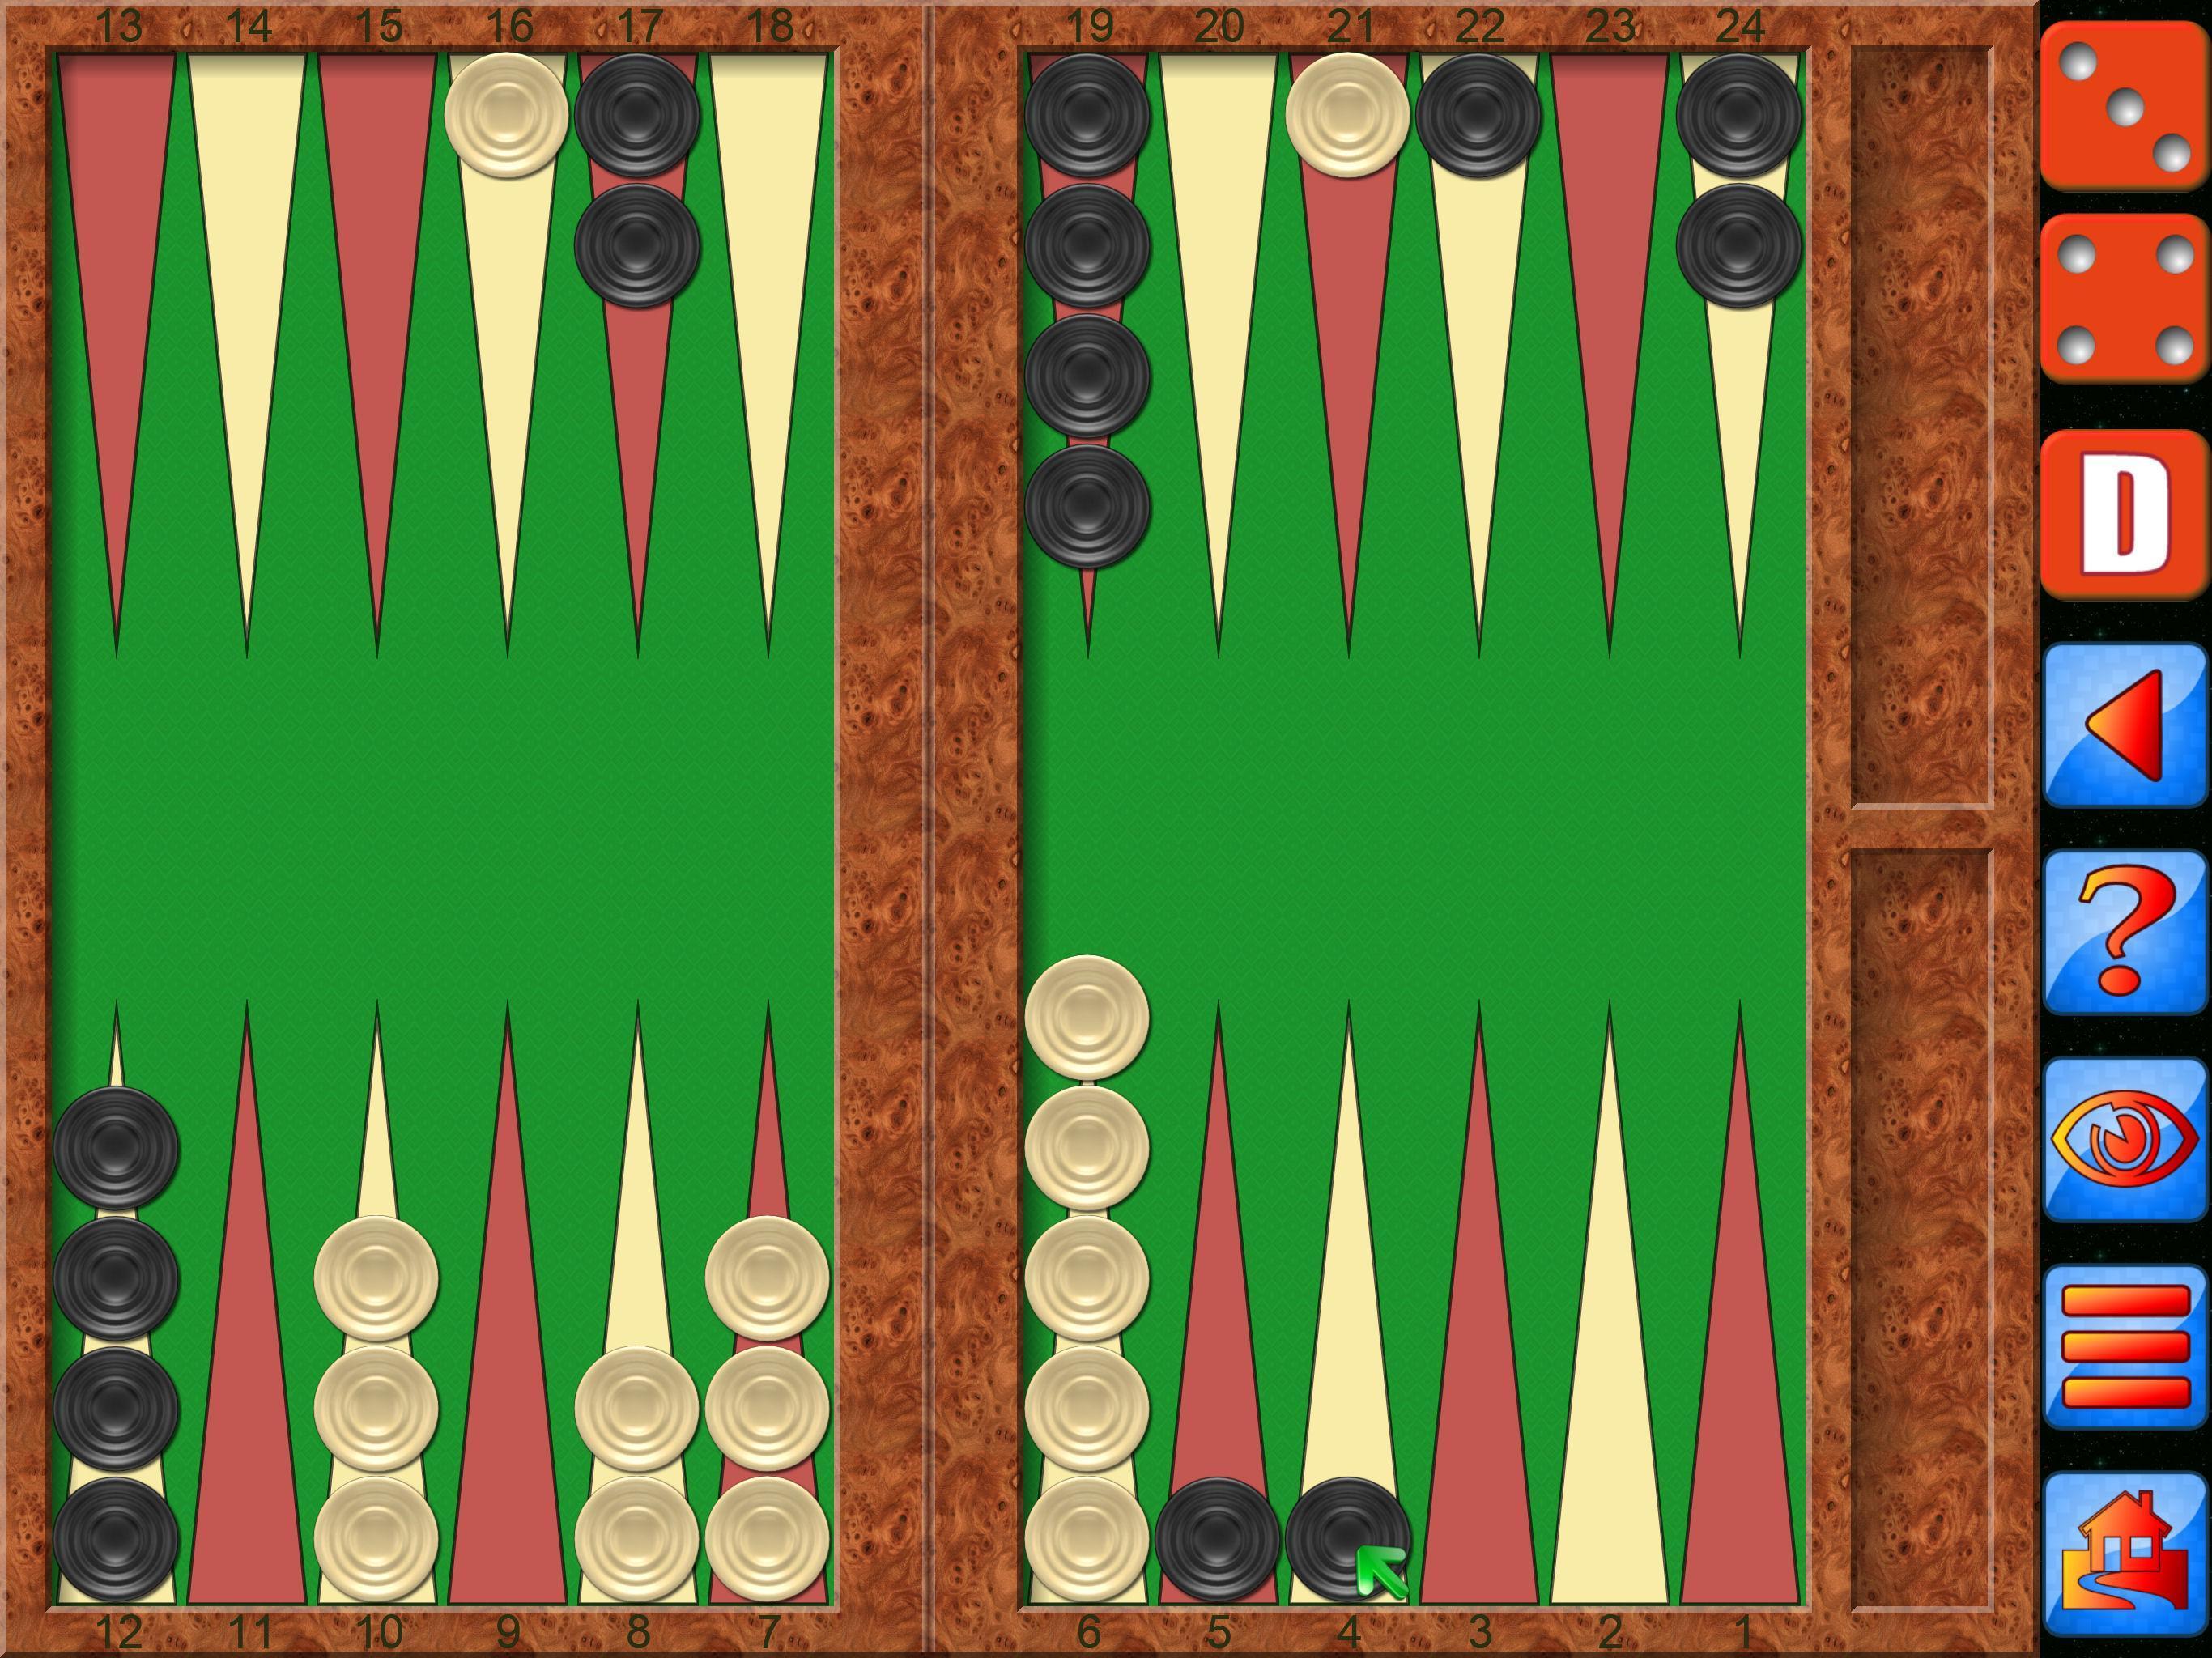 Backgammon V+, online multiplayer backgammon 5.25.64 Screenshot 11